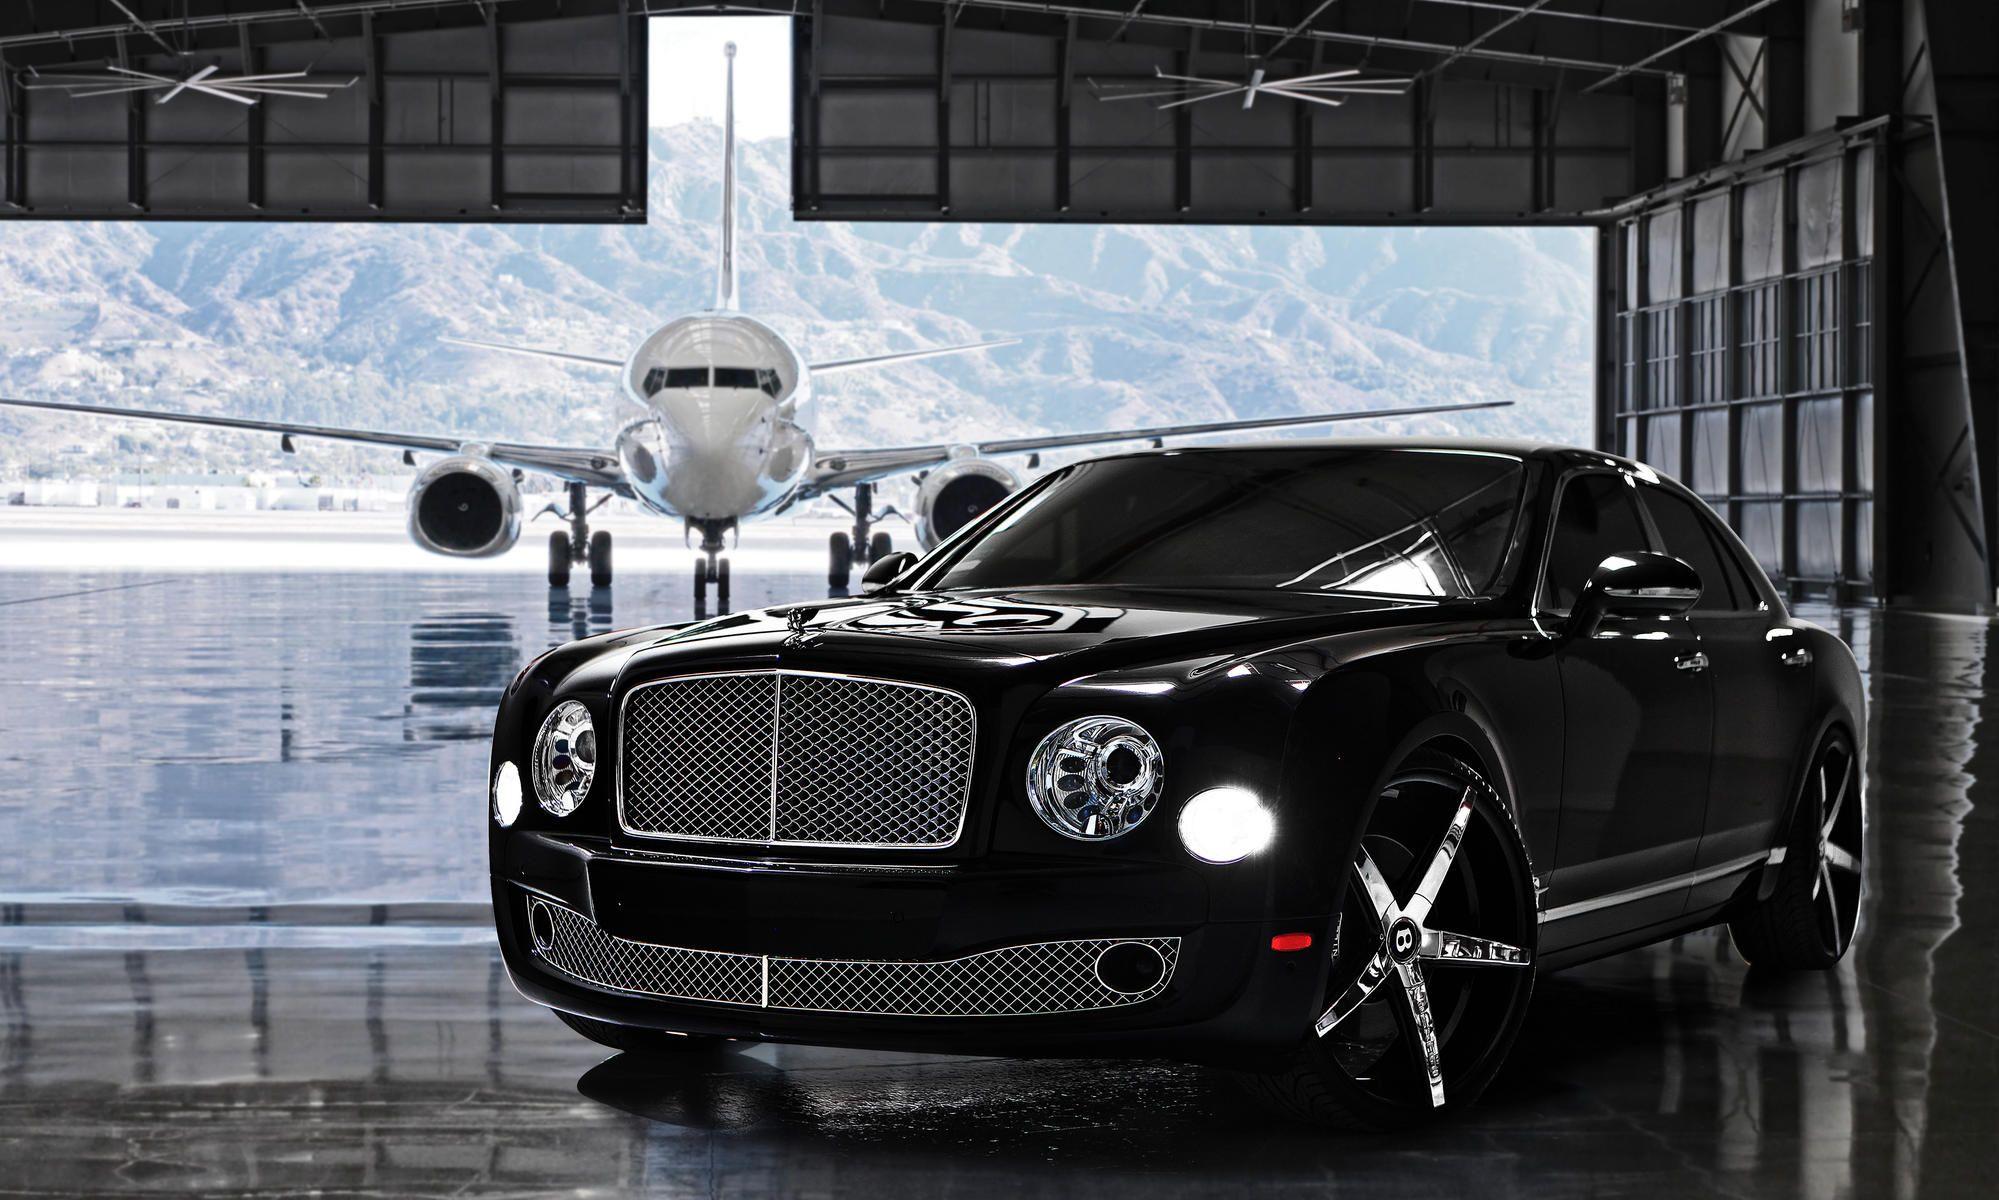 Black Luxury Vehicles: Lexani Wheels, The Leader In Custom Luxury Wheels. The